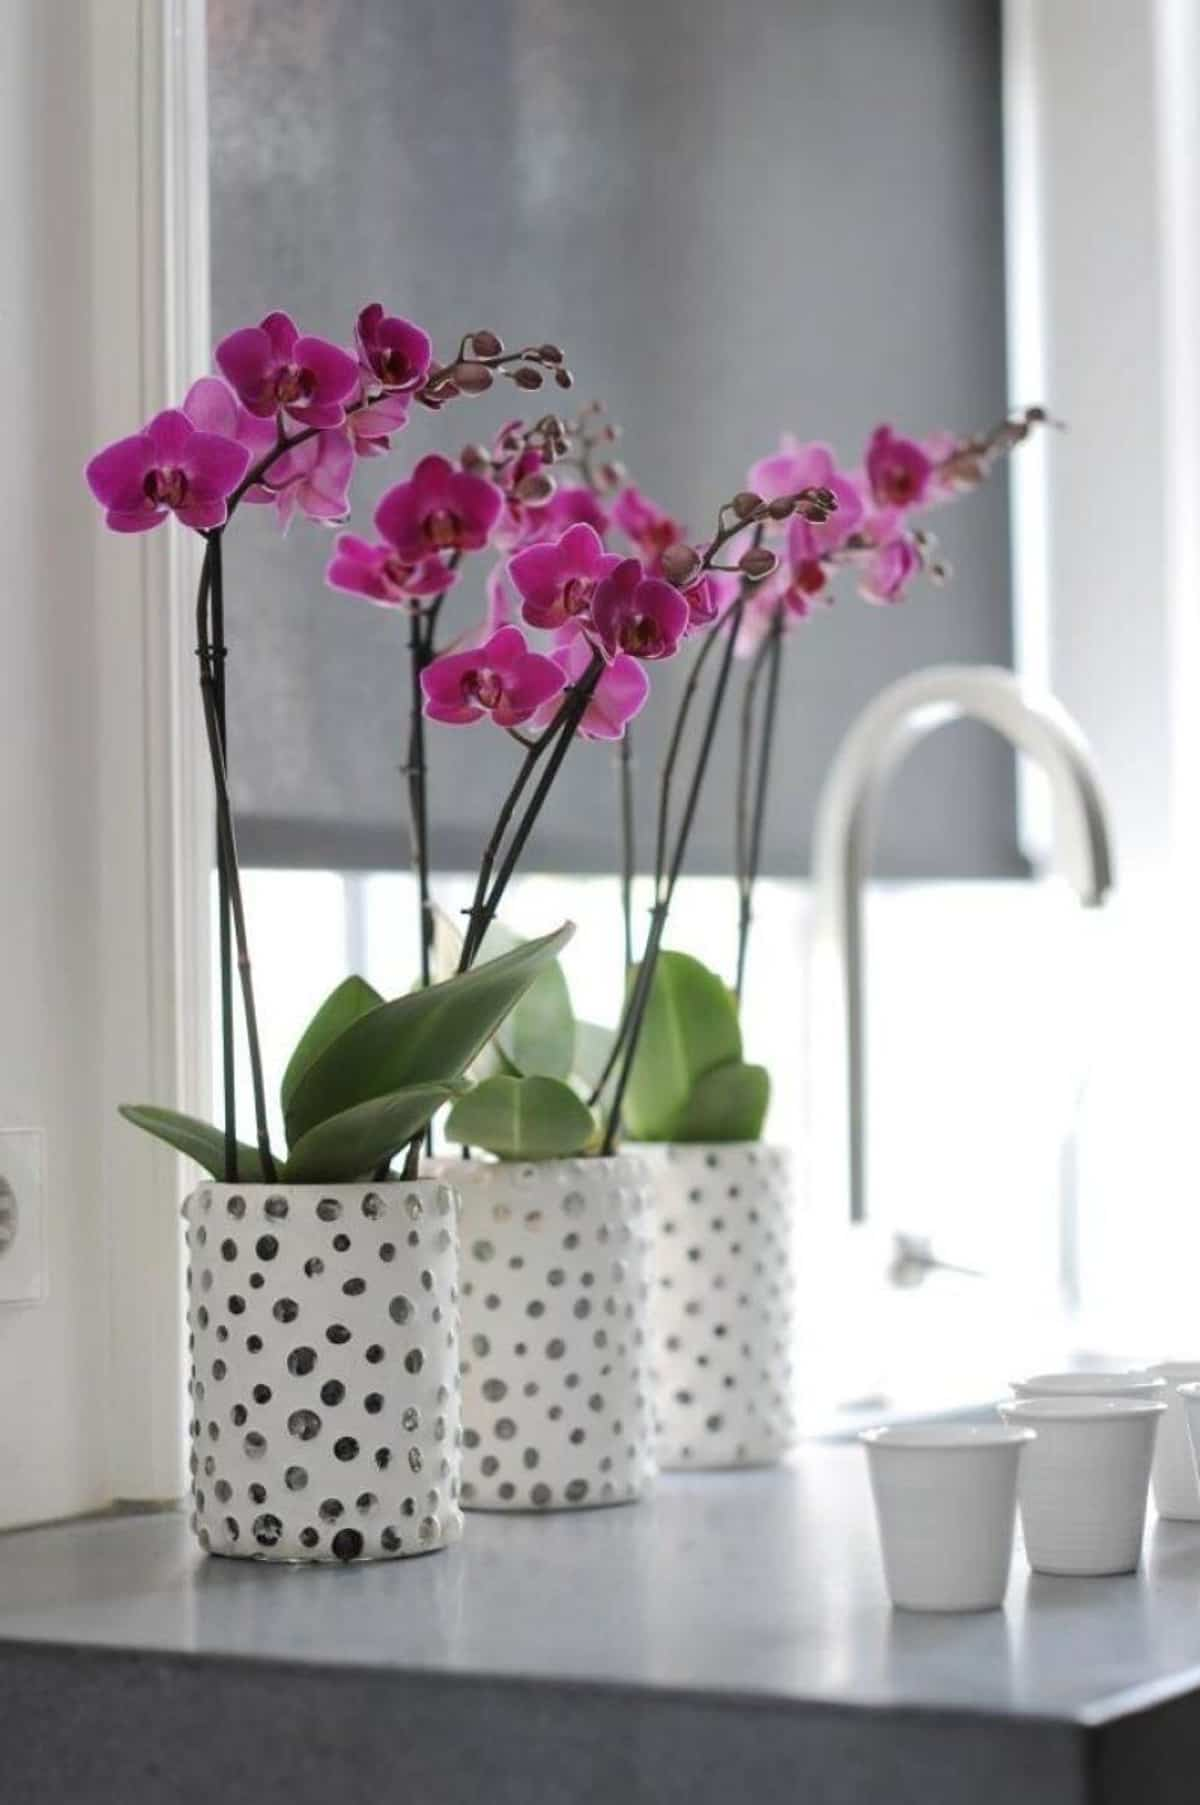 claves para decorar con orquideas tu hogar 10